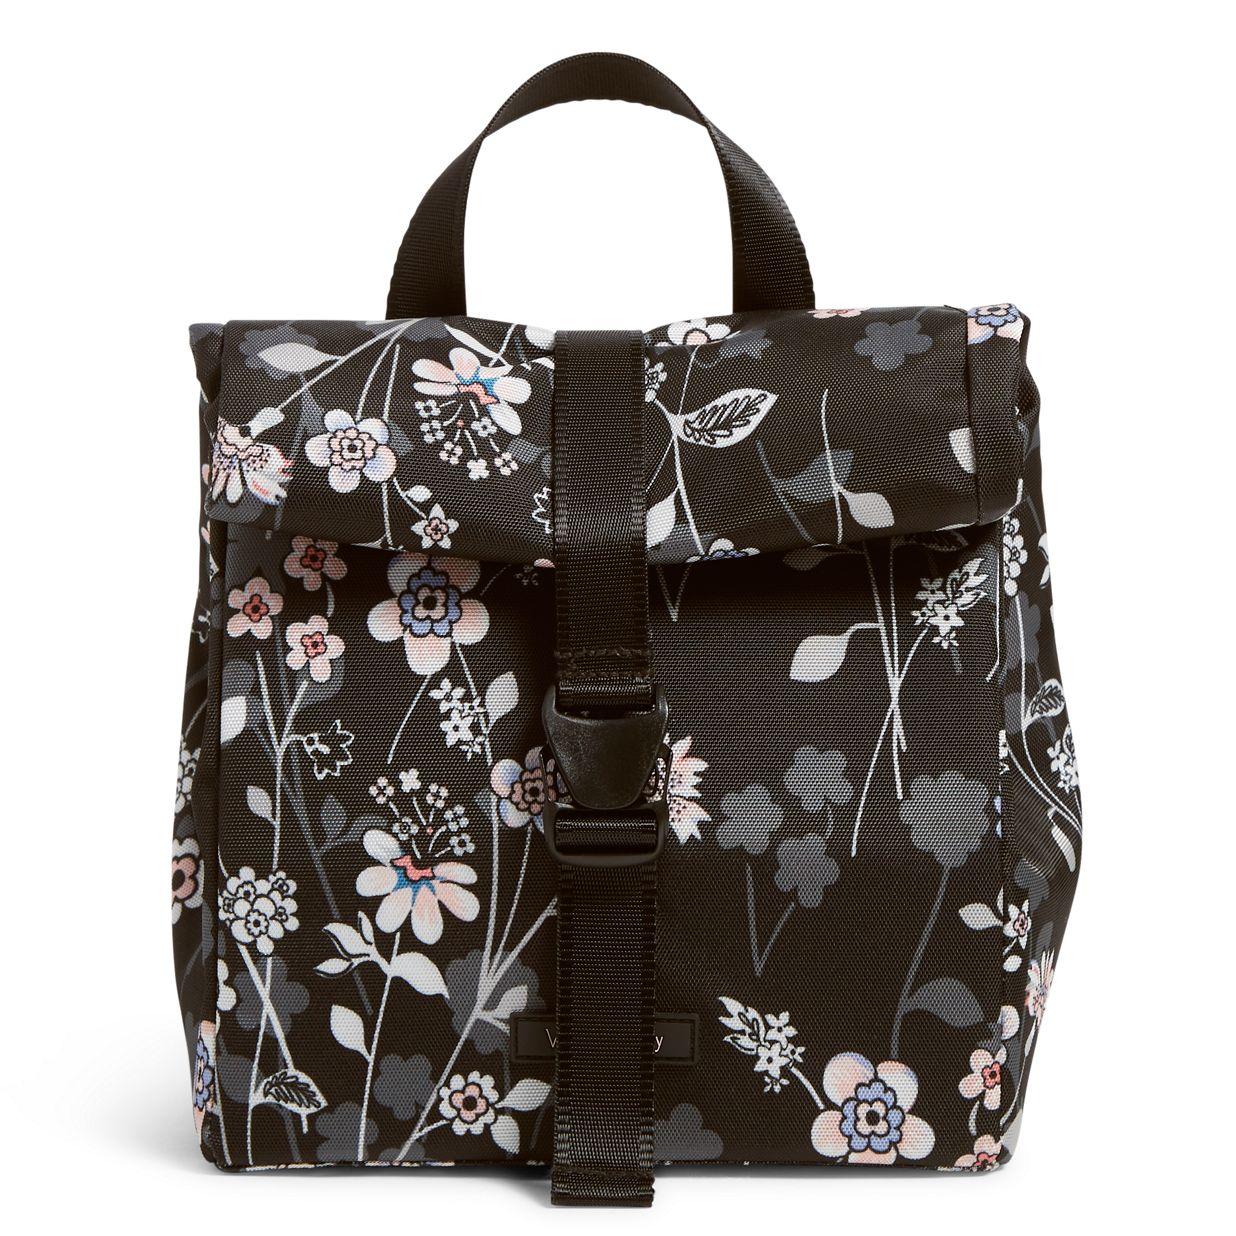 Lighten Up Lunch Tote Bag